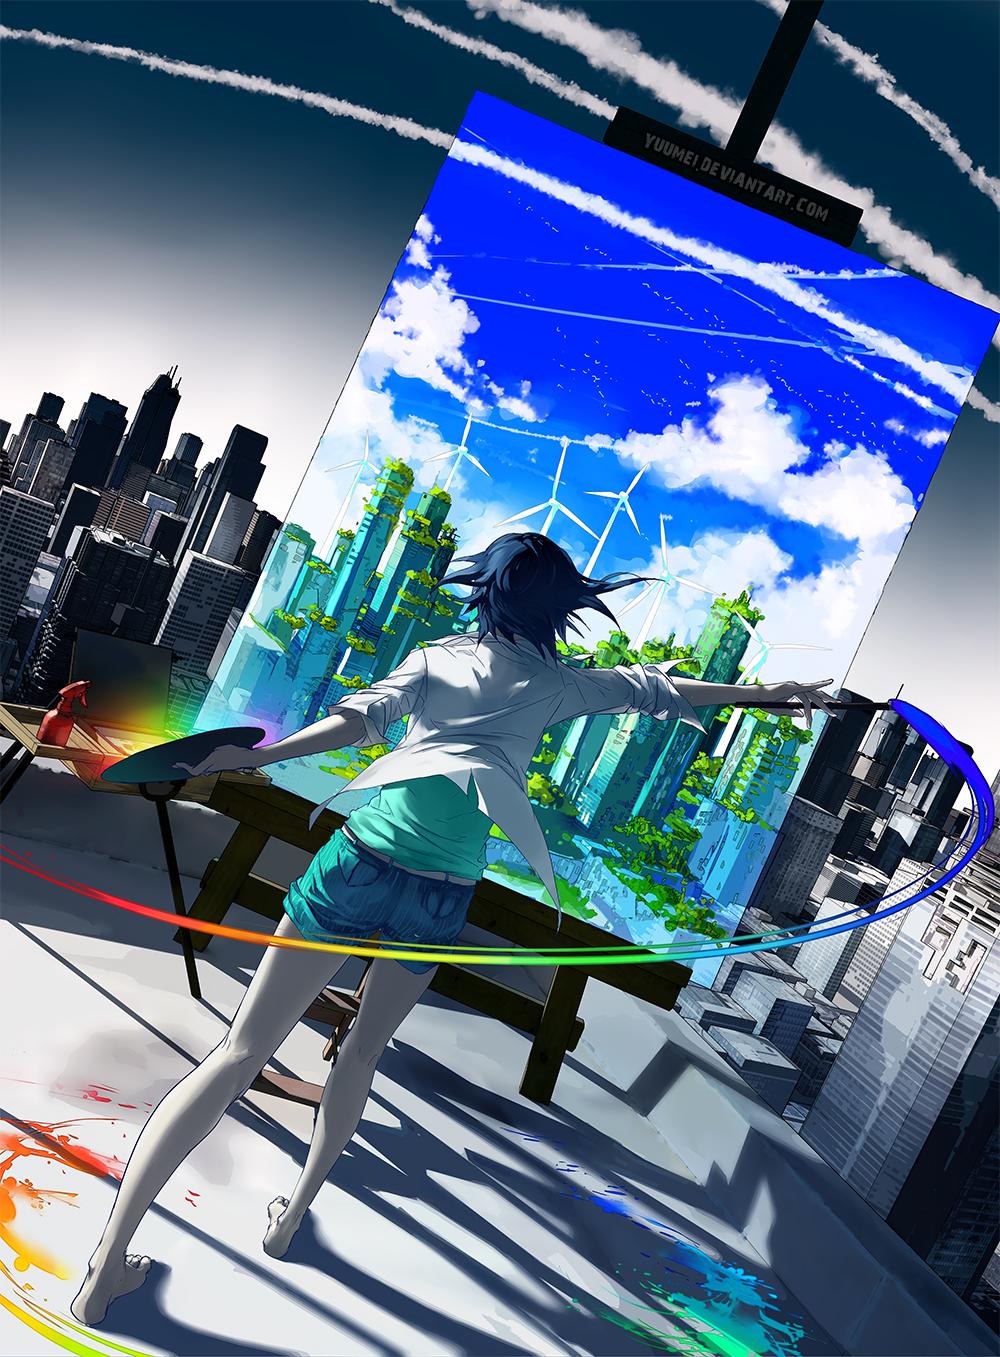 re_imagine_by_yuumei-d6b1y26.jpg?format=